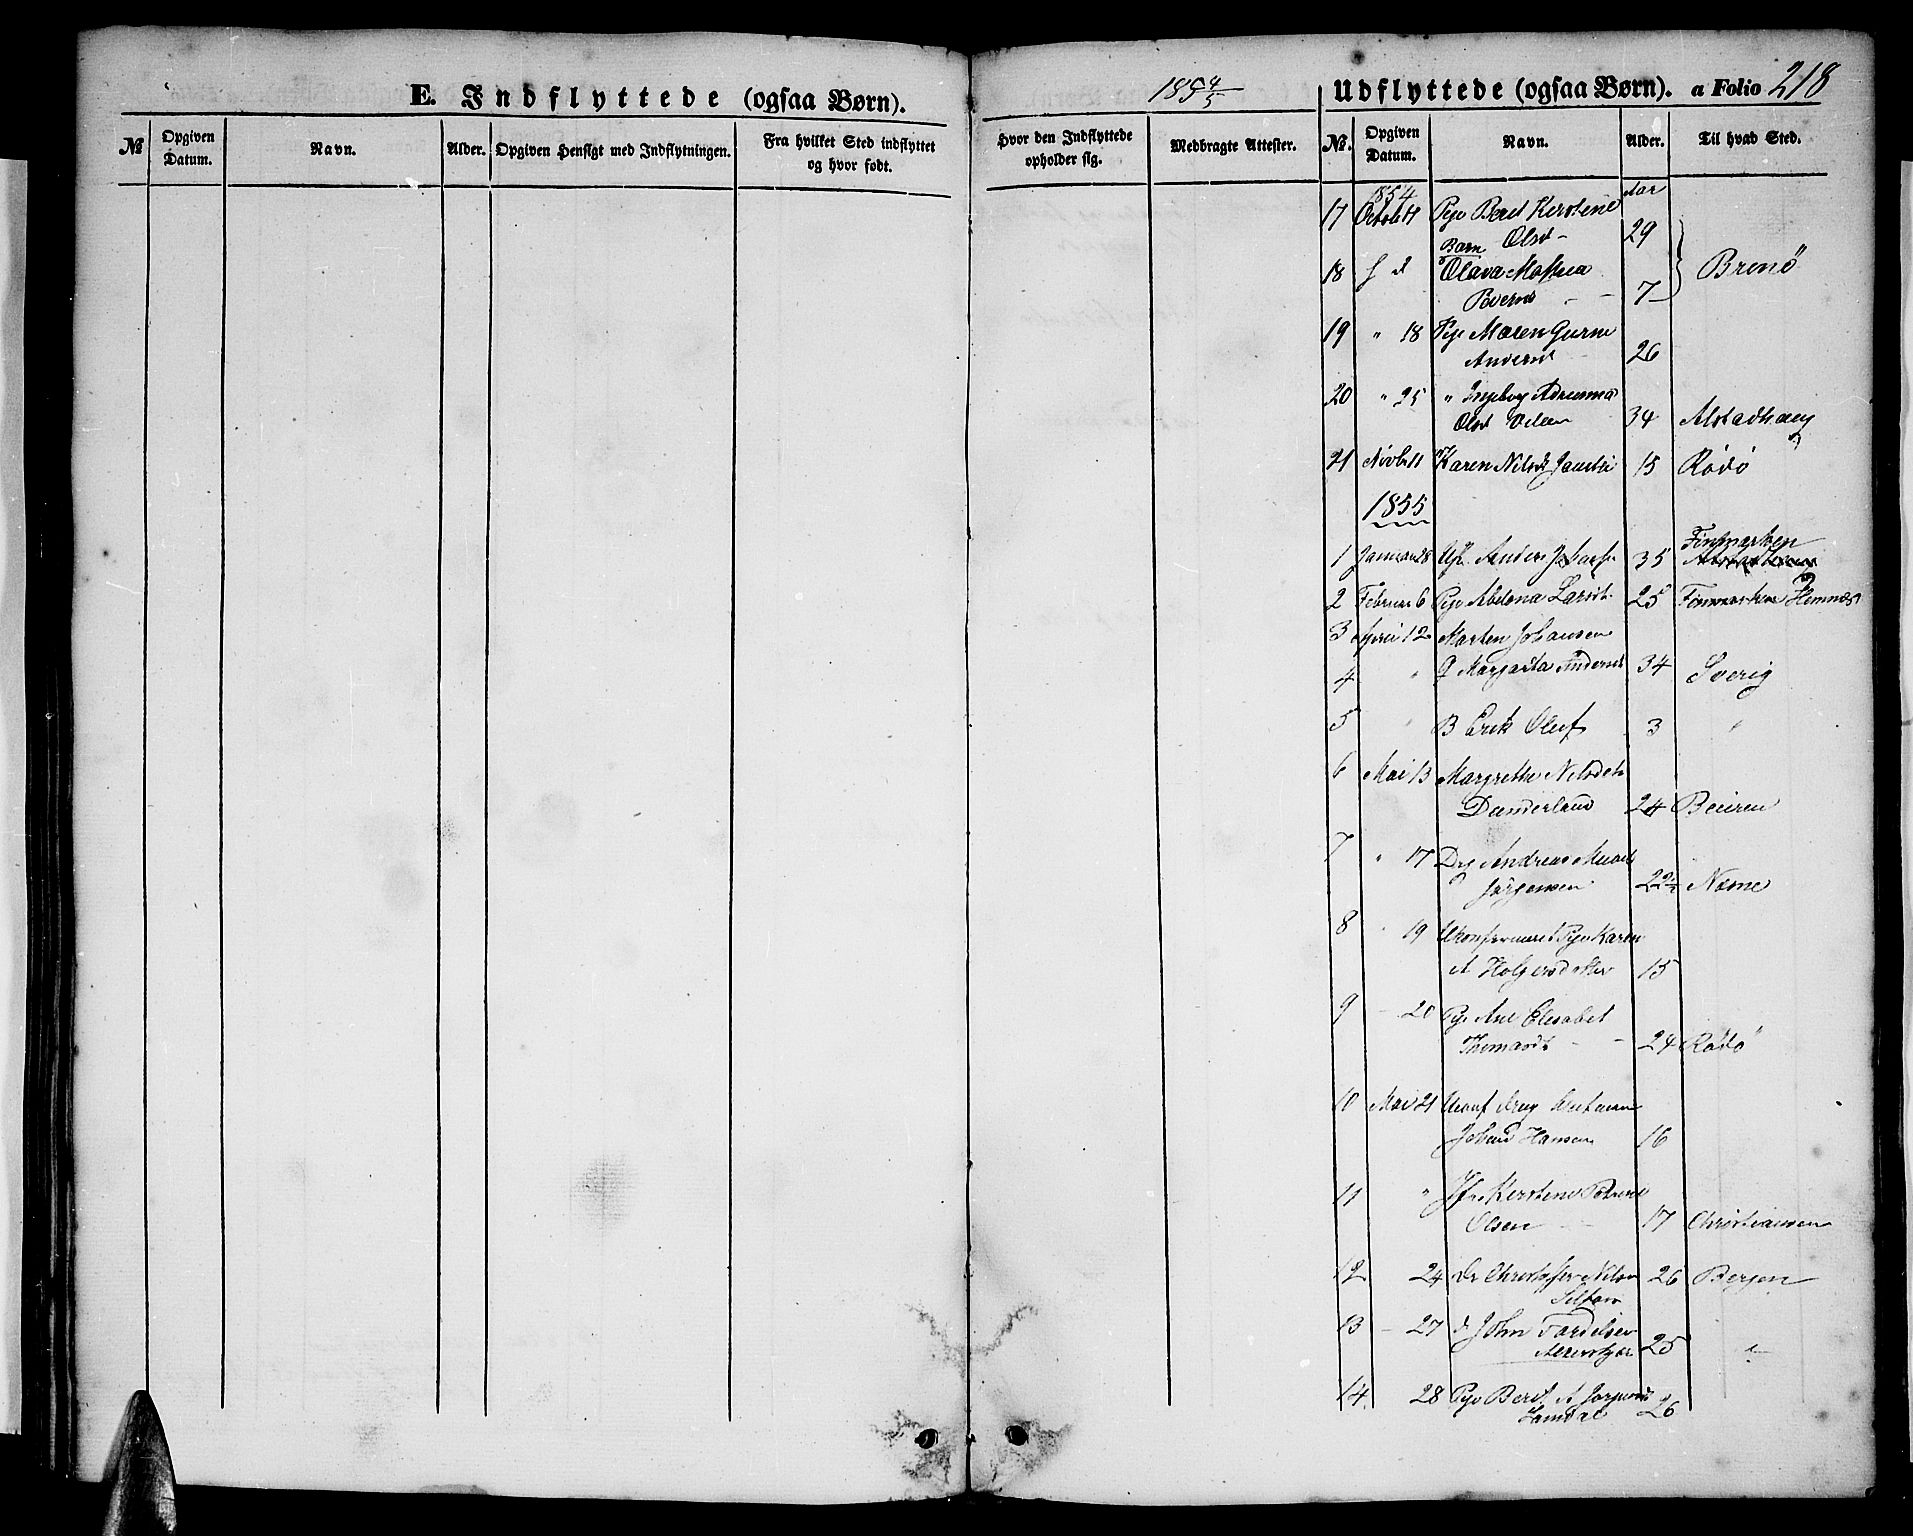 SAT, Ministerialprotokoller, klokkerbøker og fødselsregistre - Nordland, 827/L0414: Klokkerbok nr. 827C03, 1853-1865, s. 218